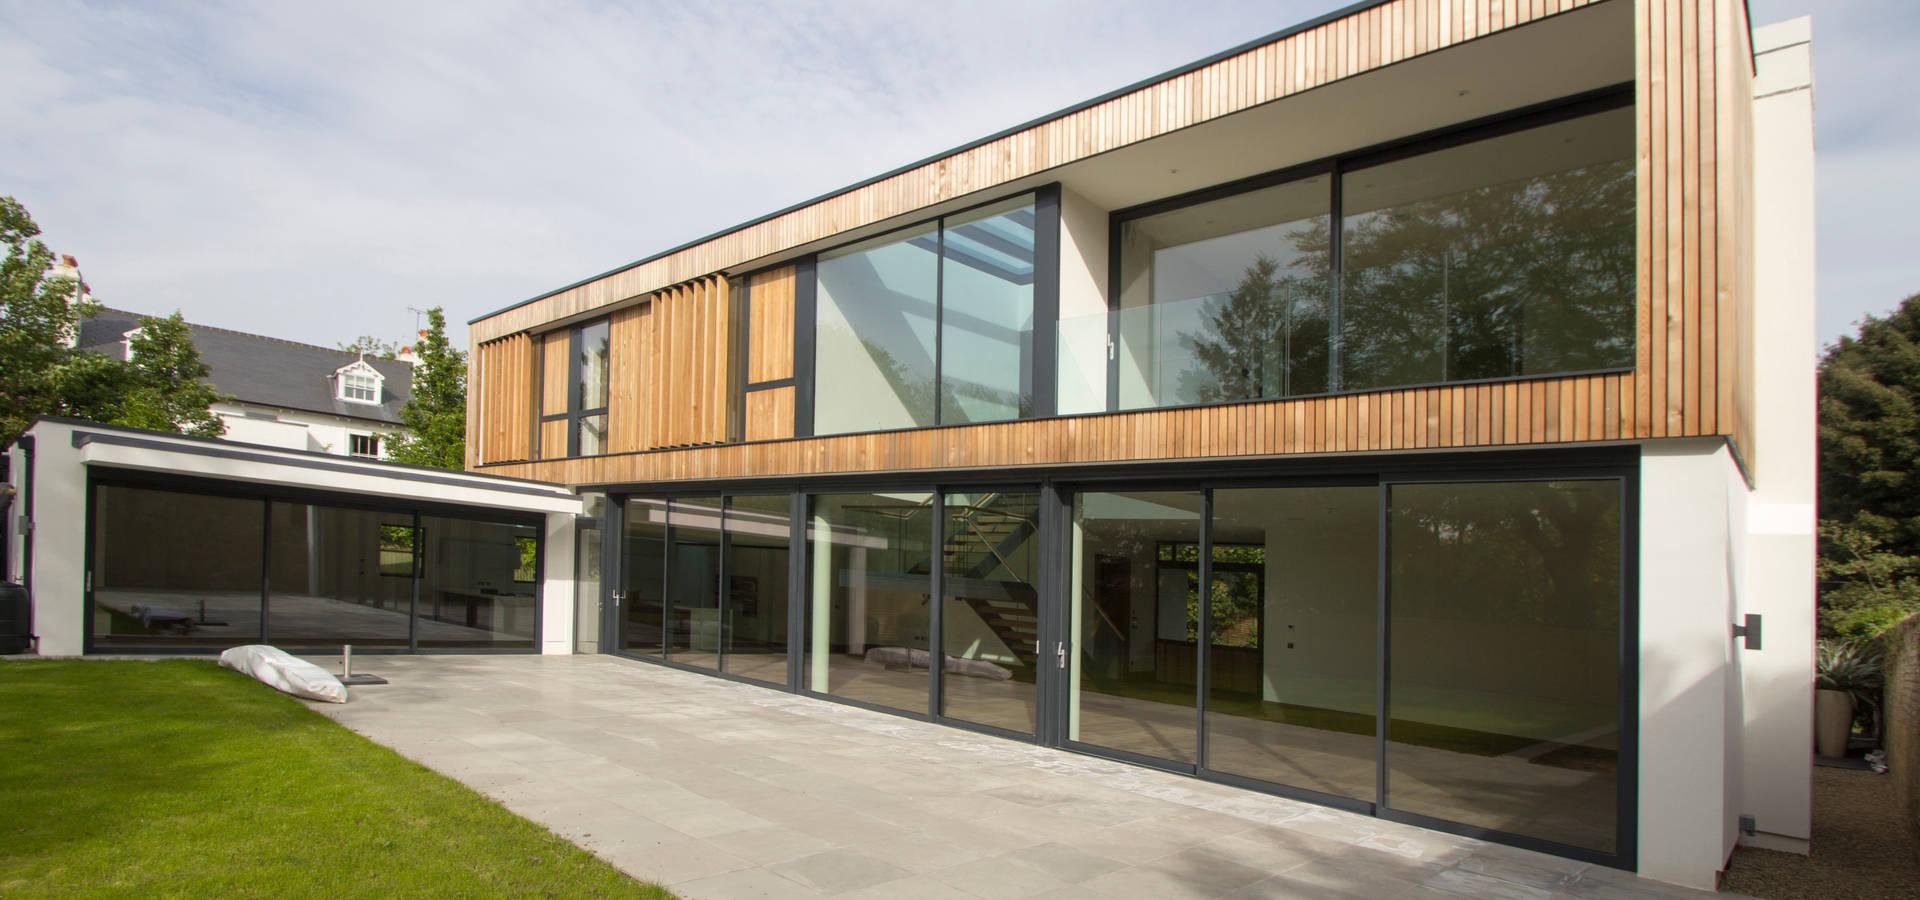 Hale Brown Architects Ltd